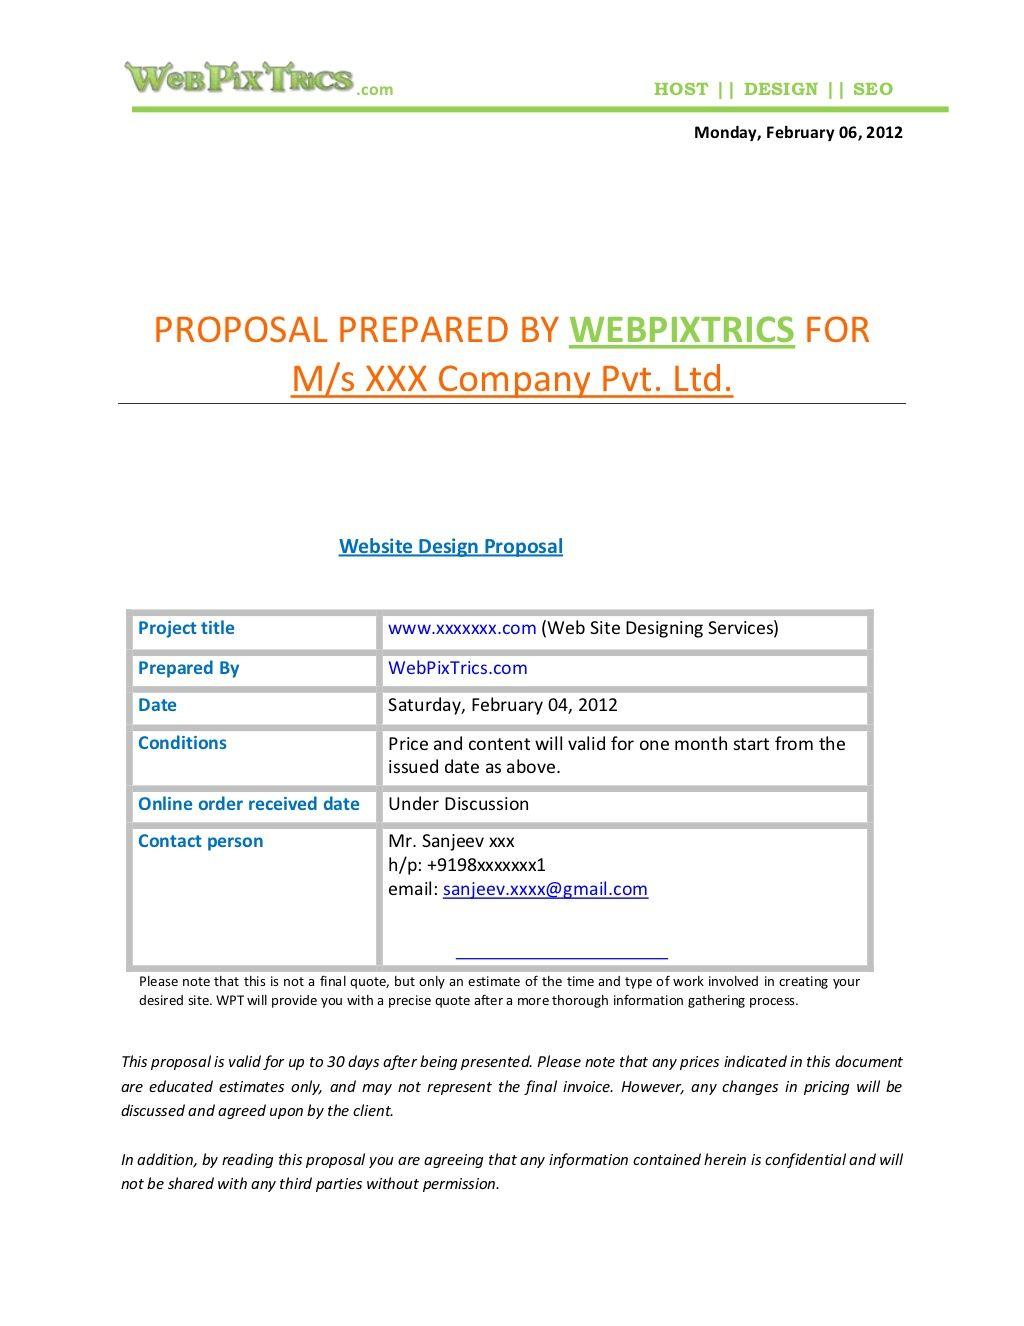 Web Design Proposal Sample By Webpixtrics Com Via Slideshare Web Design Quotes Web Design Proposal Pamphlet Template